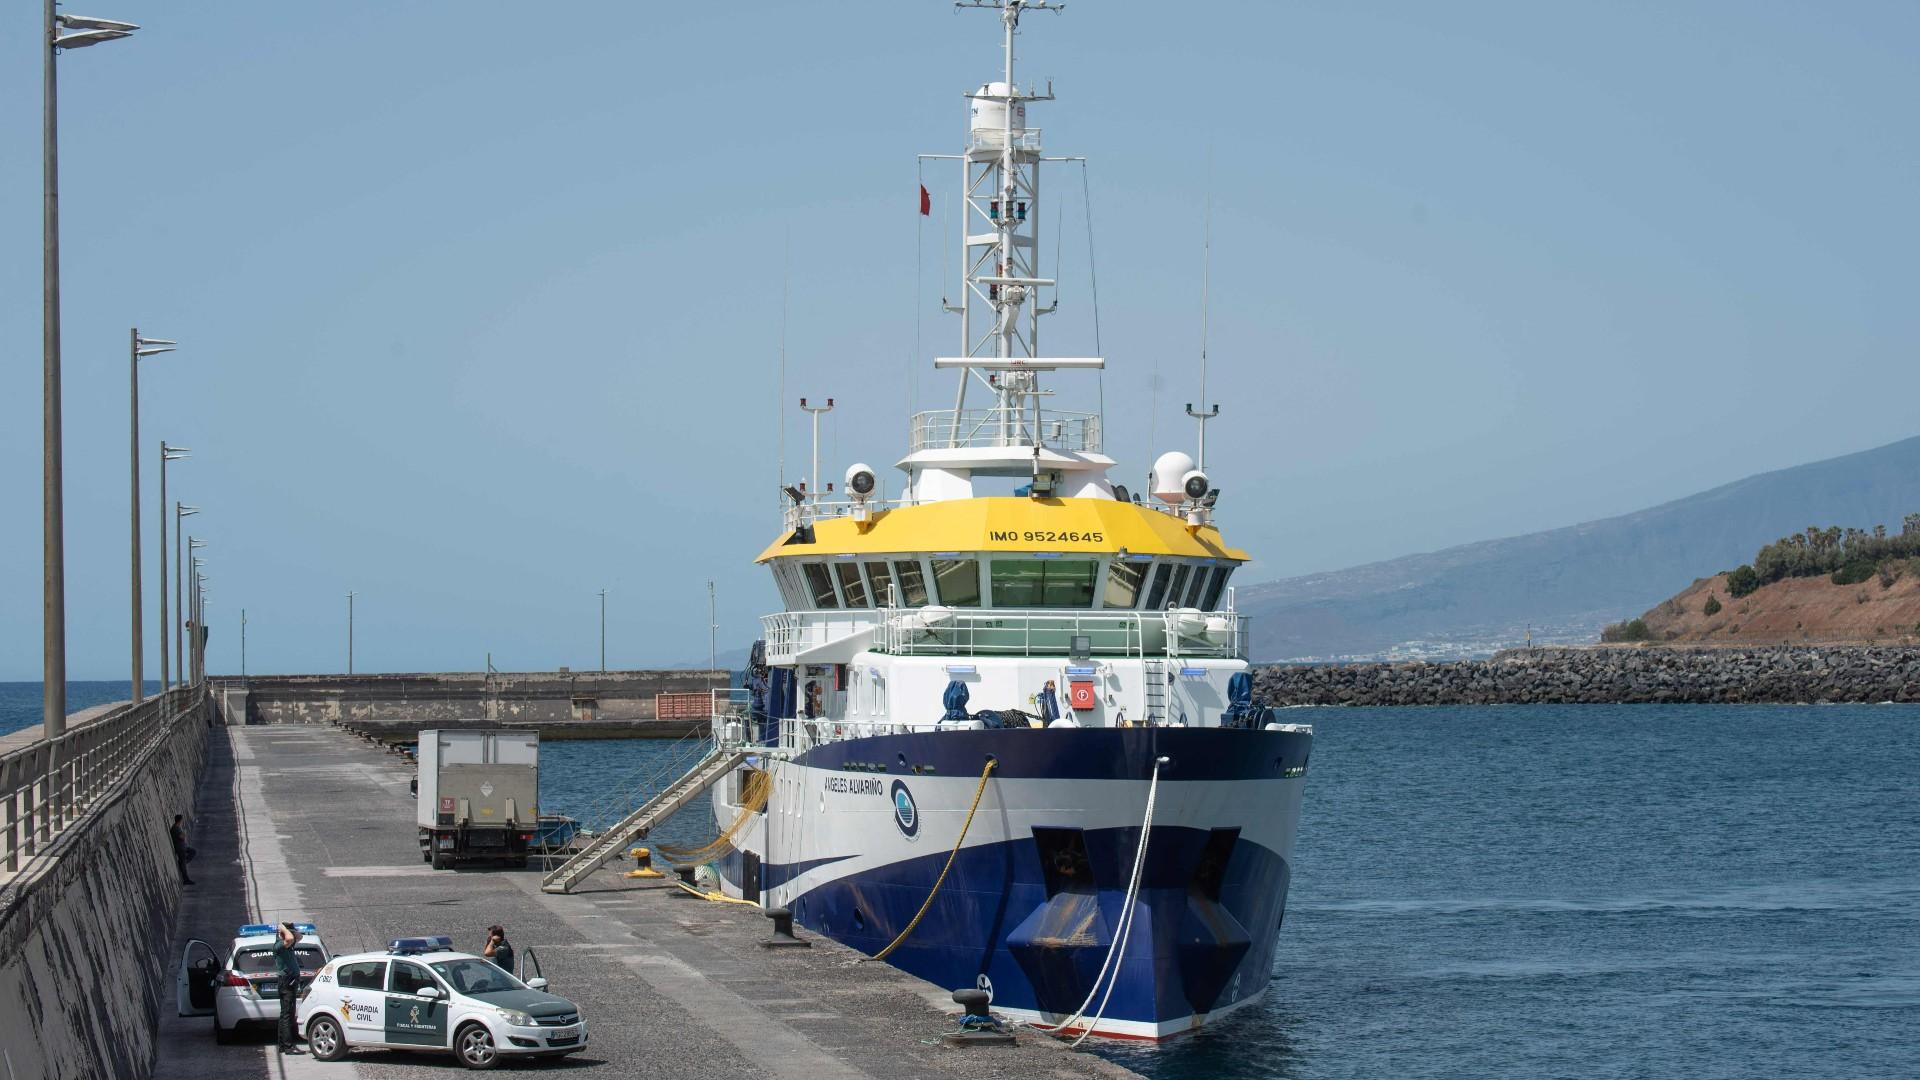 Ir al VideoLa Guardia Civil busca alternativas diferentes al buque Ángeles Alvariño para encontrar a Anna